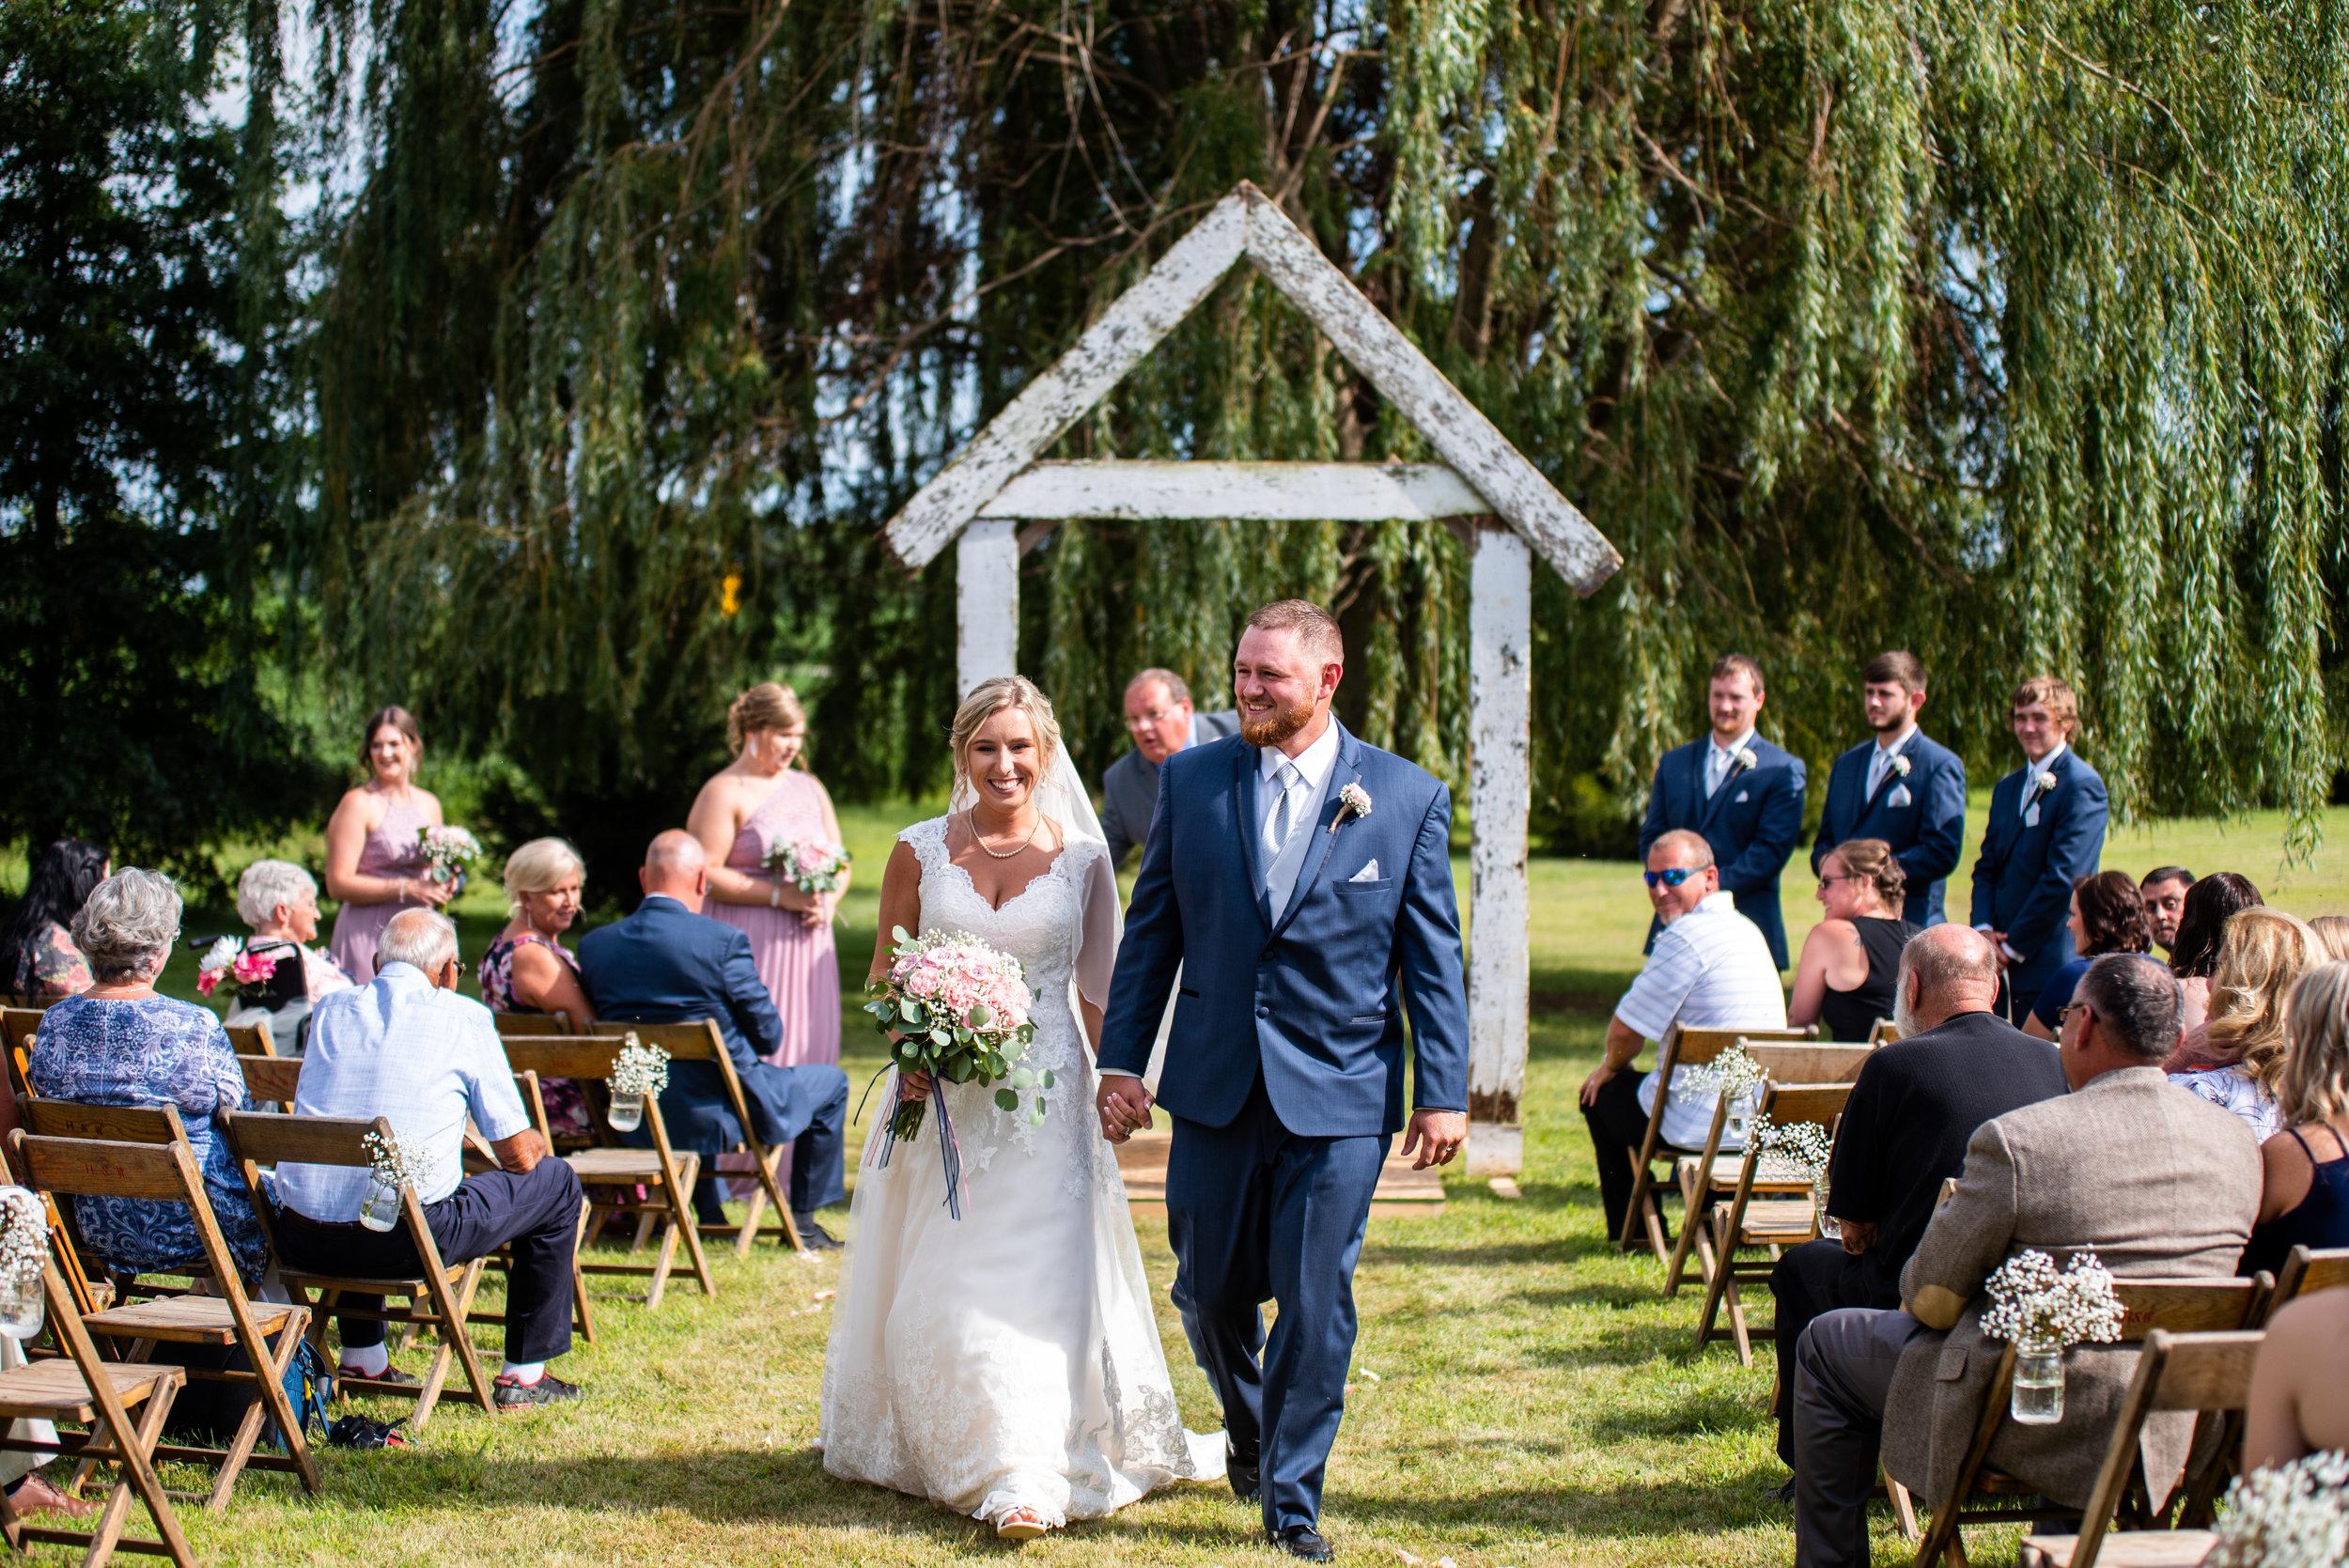 wedding (1 of 1)-91.jpg